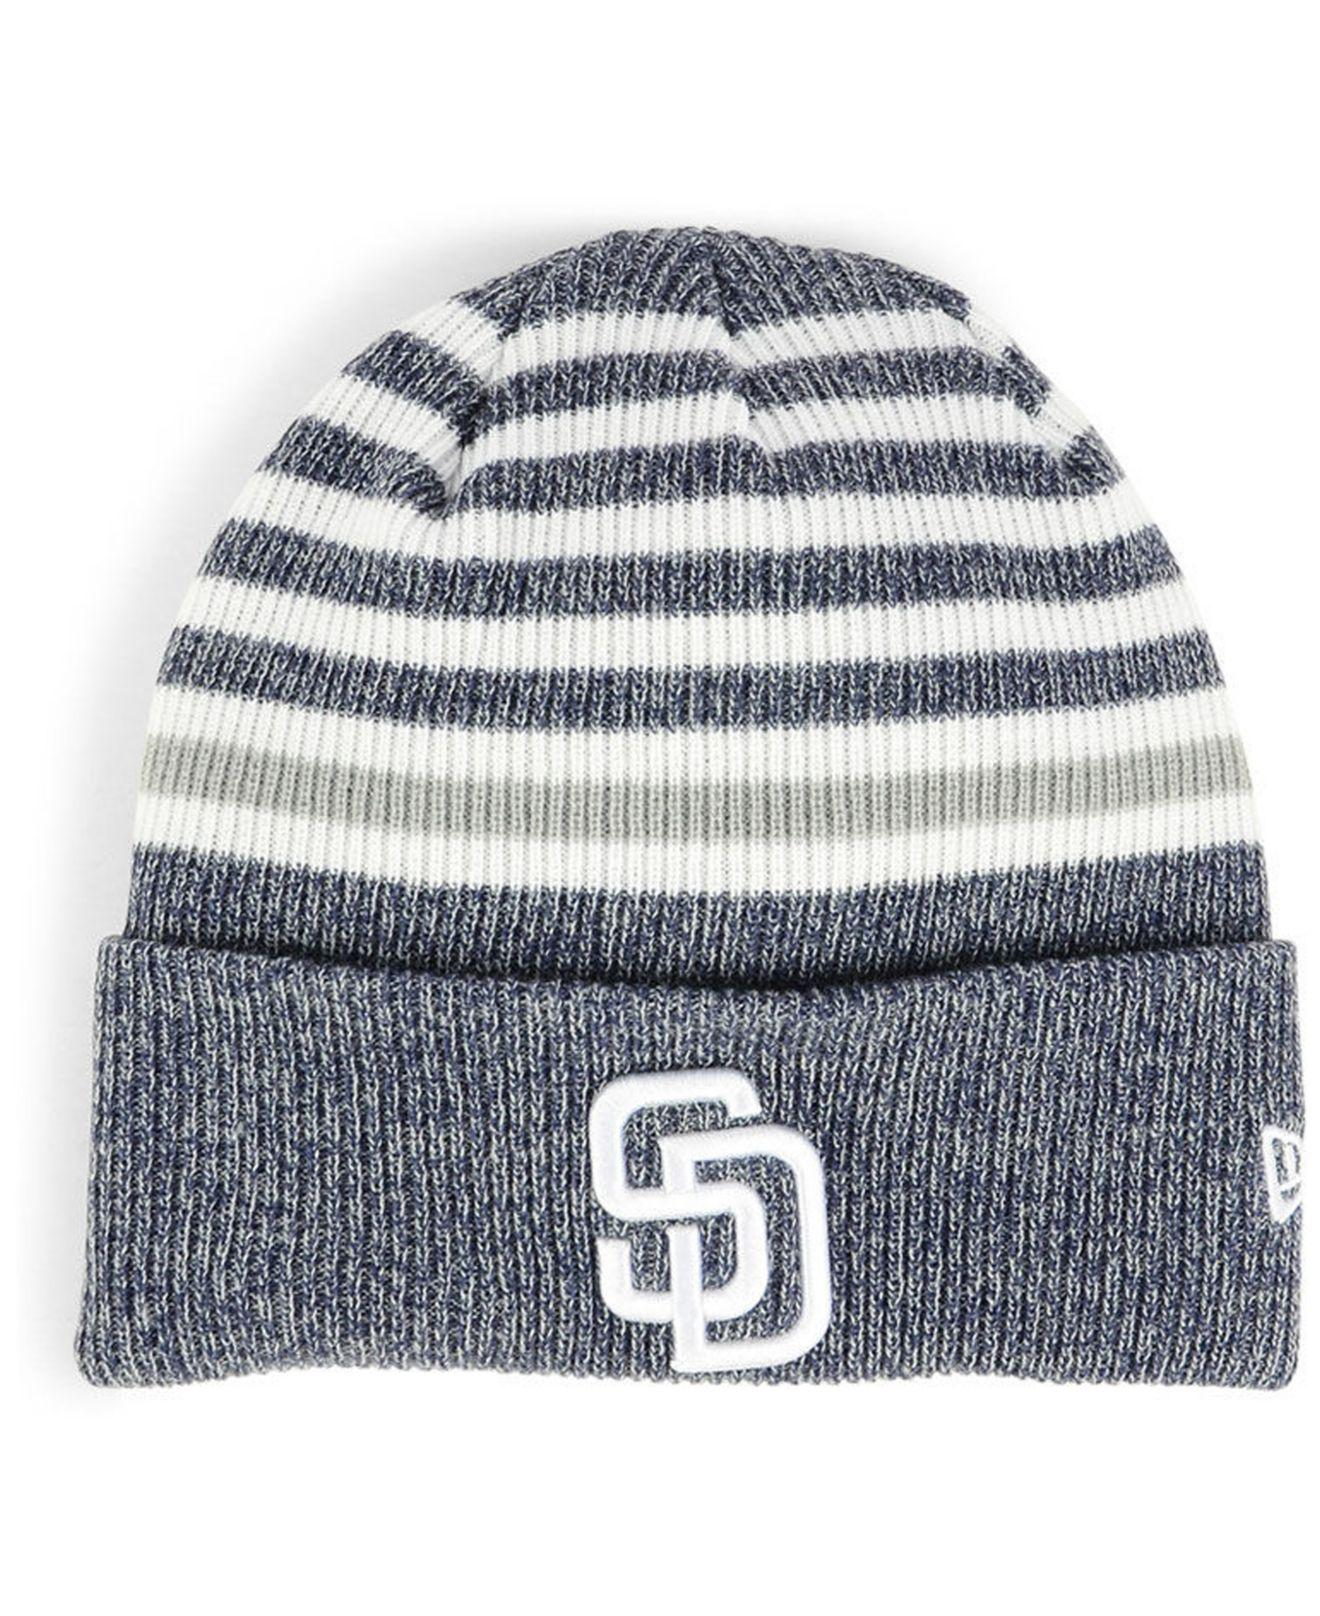 official photos 2a4e0 ffbcf Lyst - KTZ San Diego Padres Striped Cuff Knit Hat